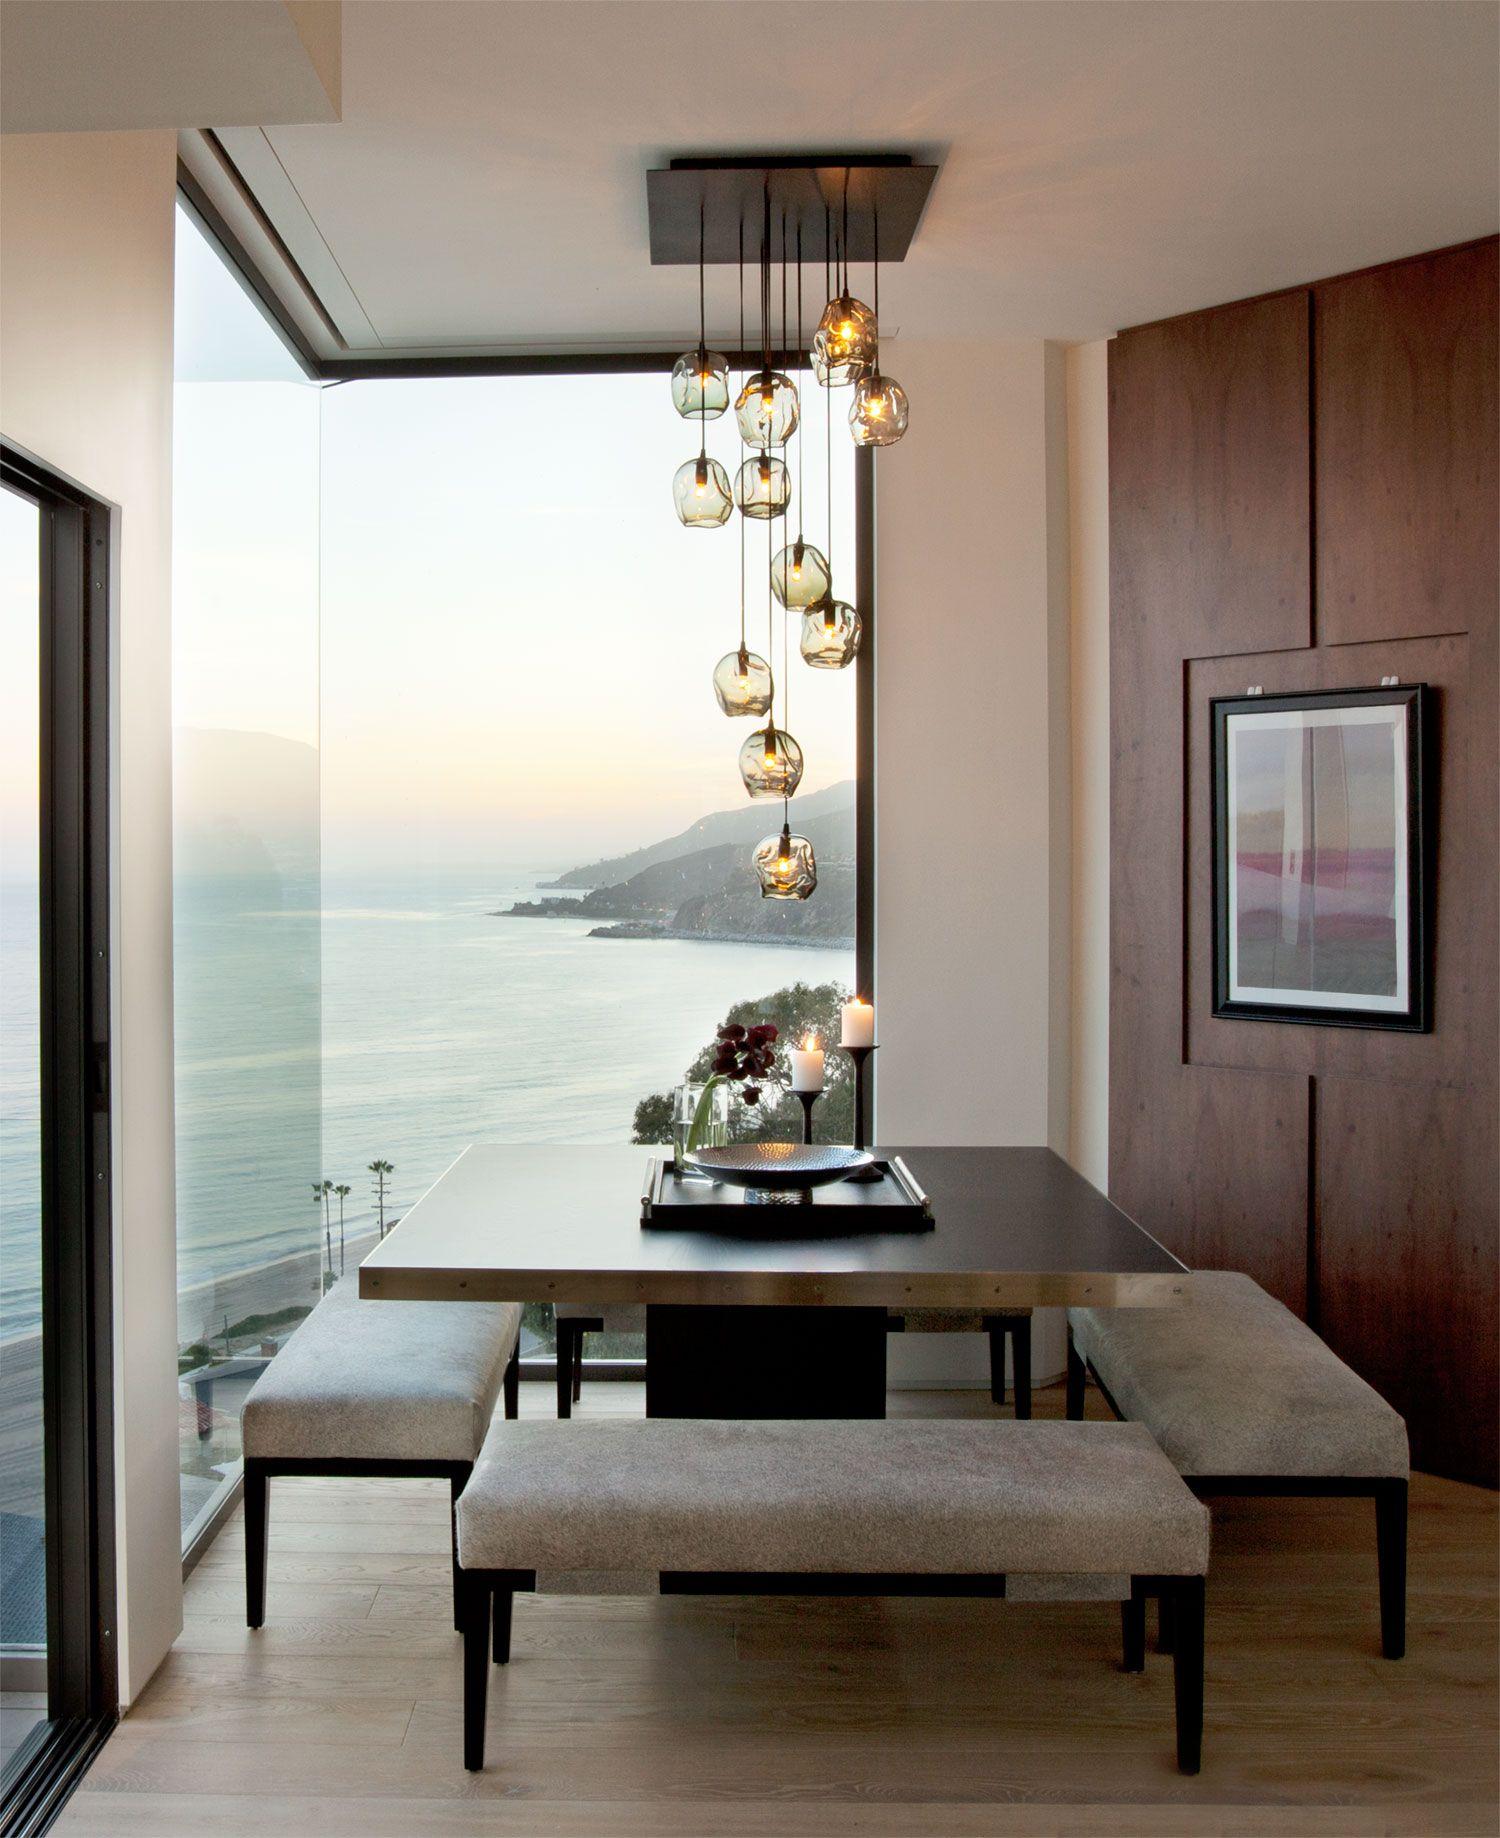 modern-architecture-residential-remodel-interior-inspirational-view-shubindonaldson-revello-residence-1 modern-architecture-residential-remodel-interior-inspirational-view-shubindonaldson-revello-residence-1